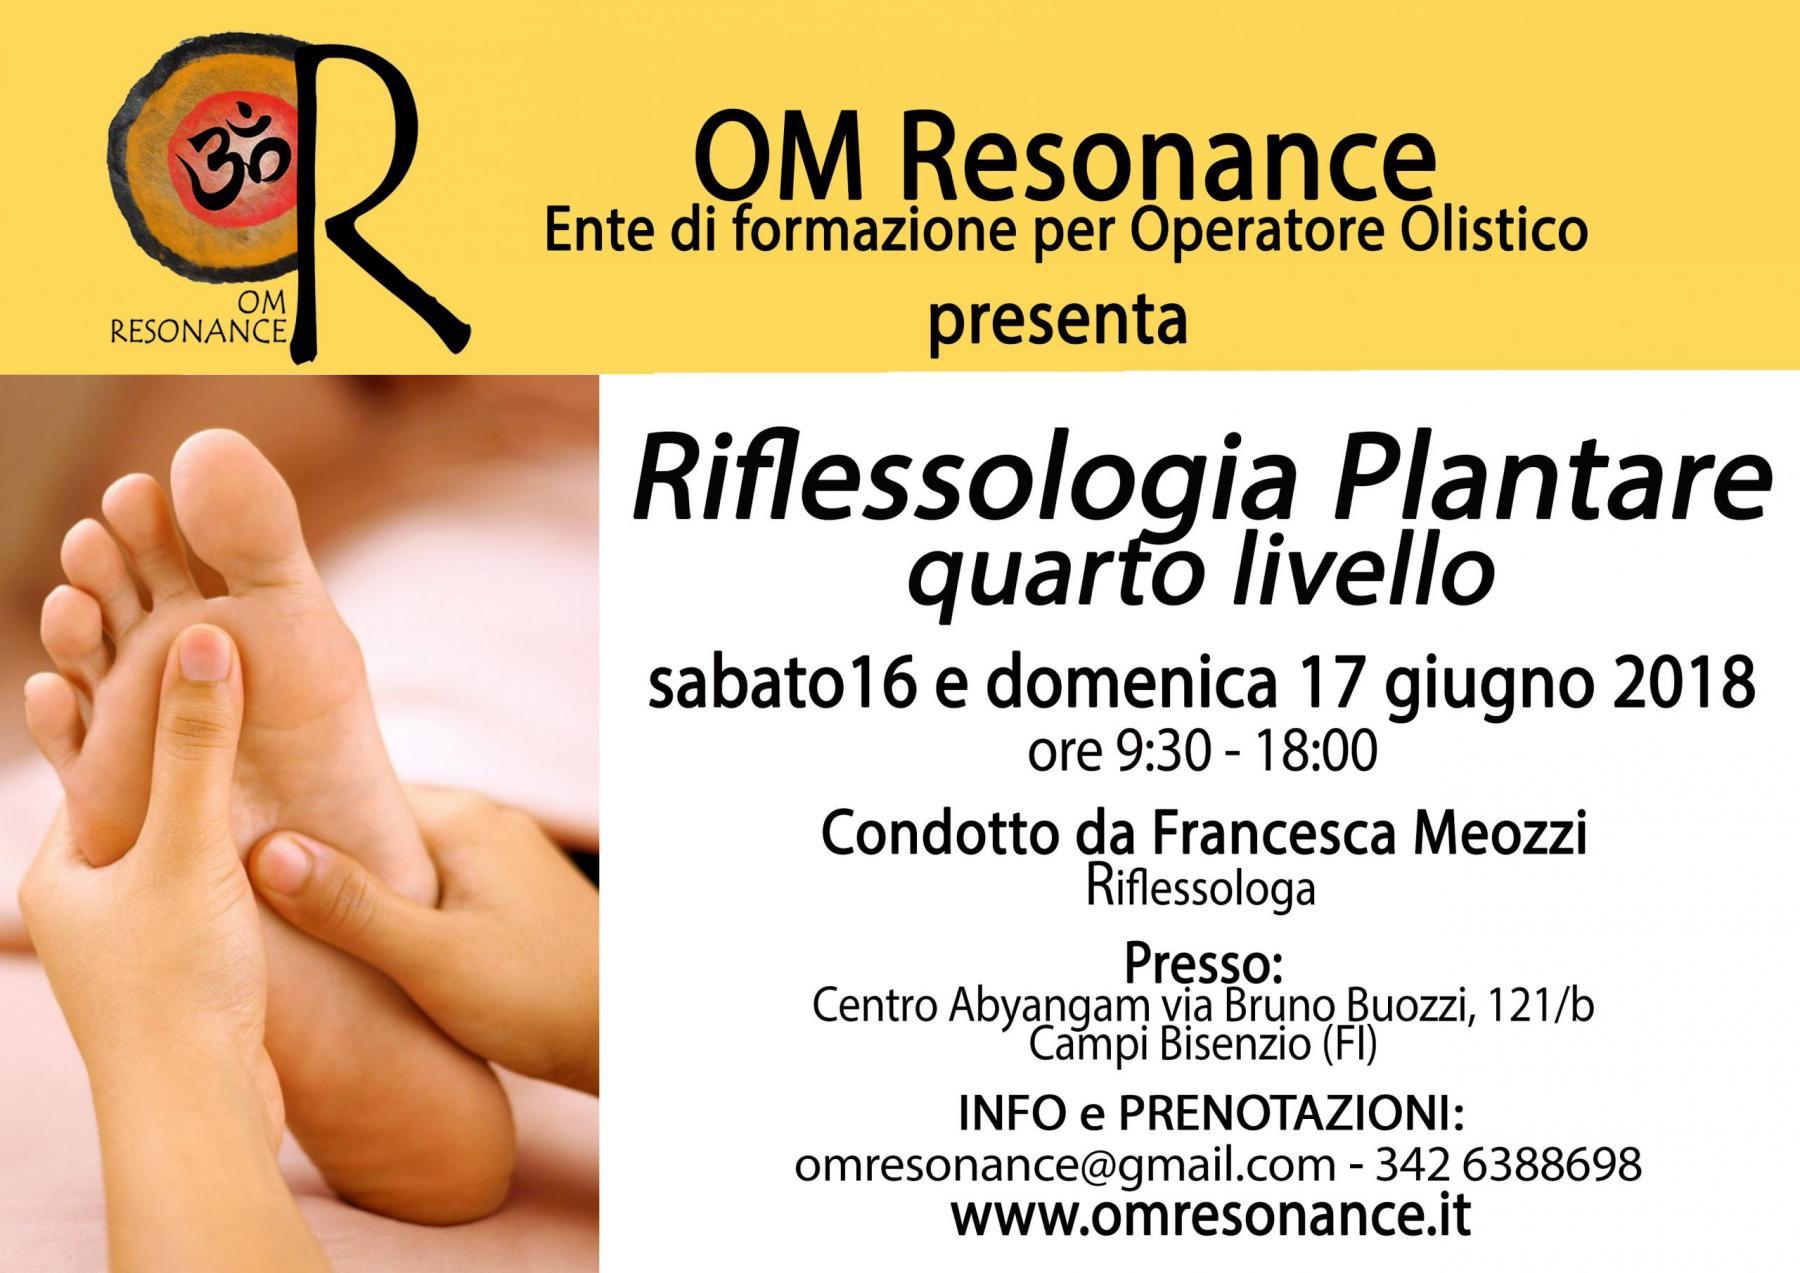 Riflessologia Plantare Firenze OM Resonance